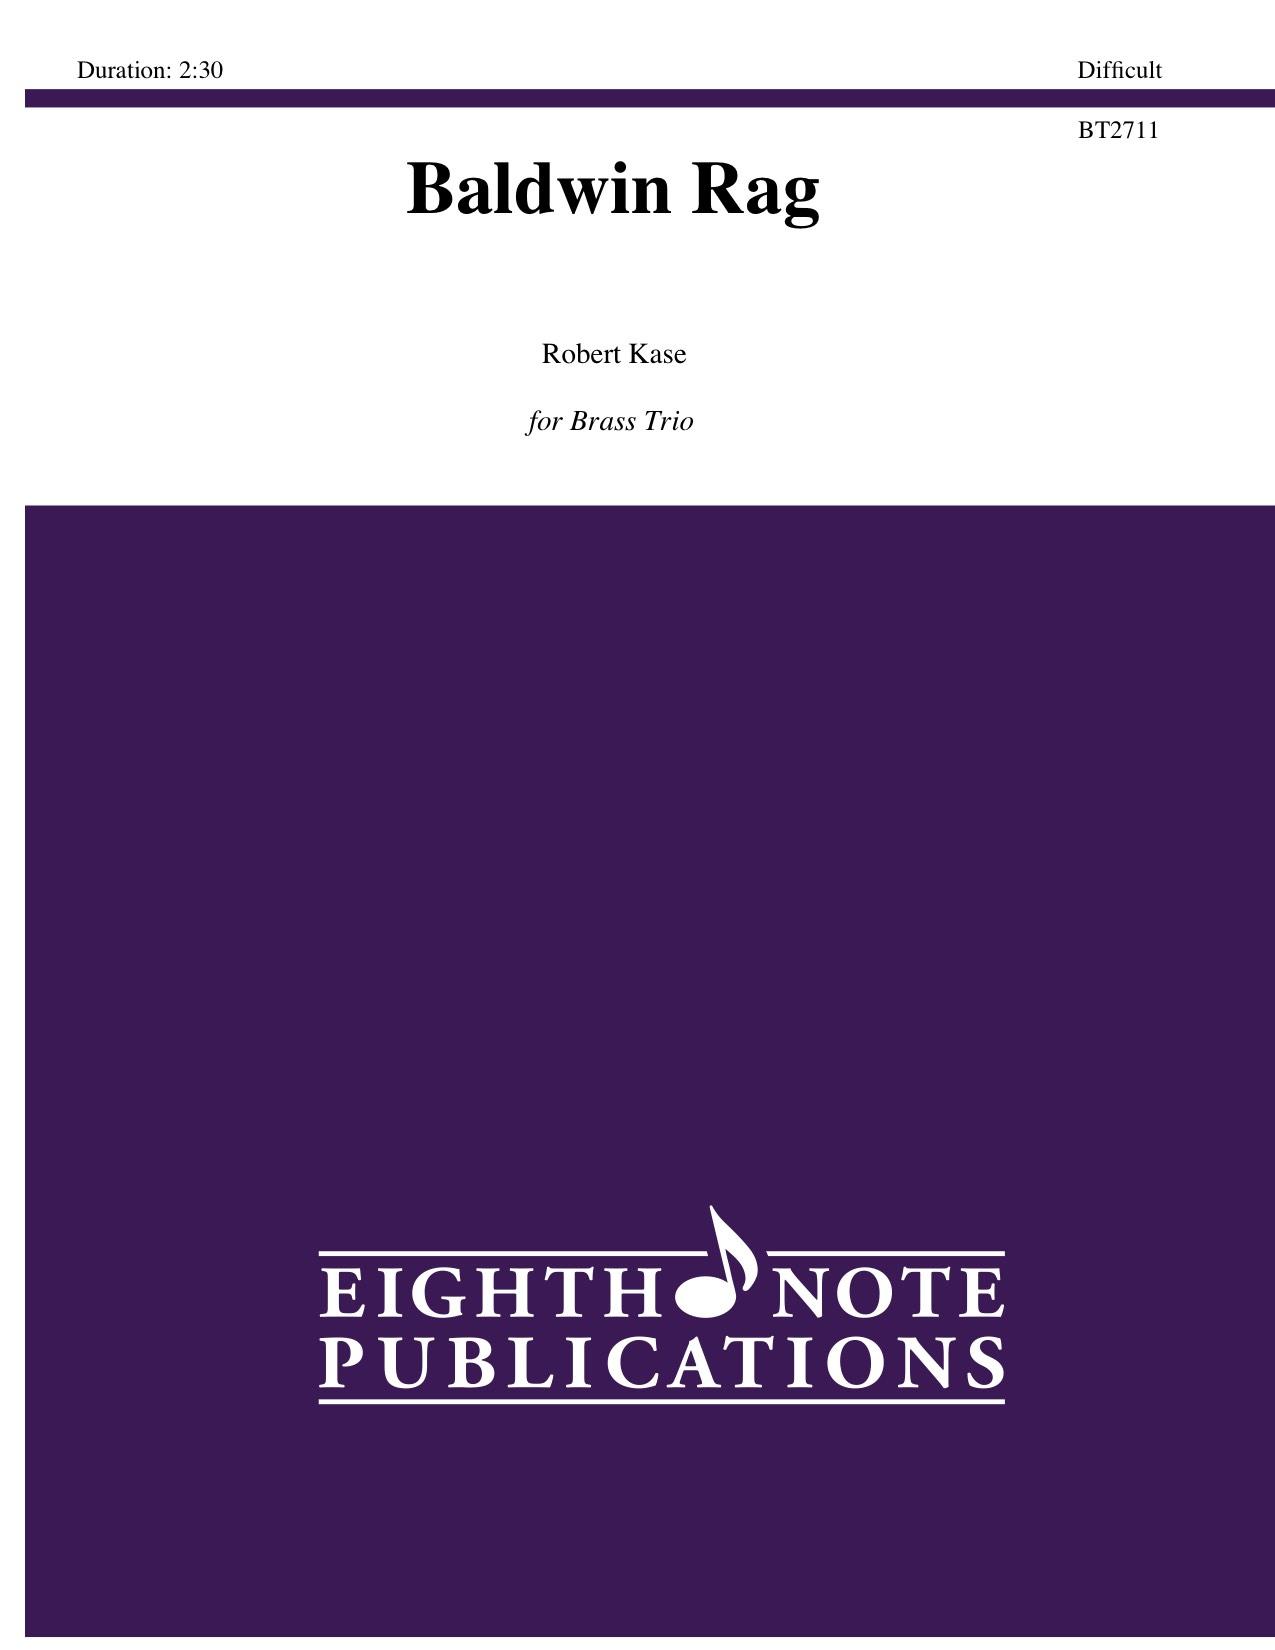 Baldwin Rag - Robert Kase